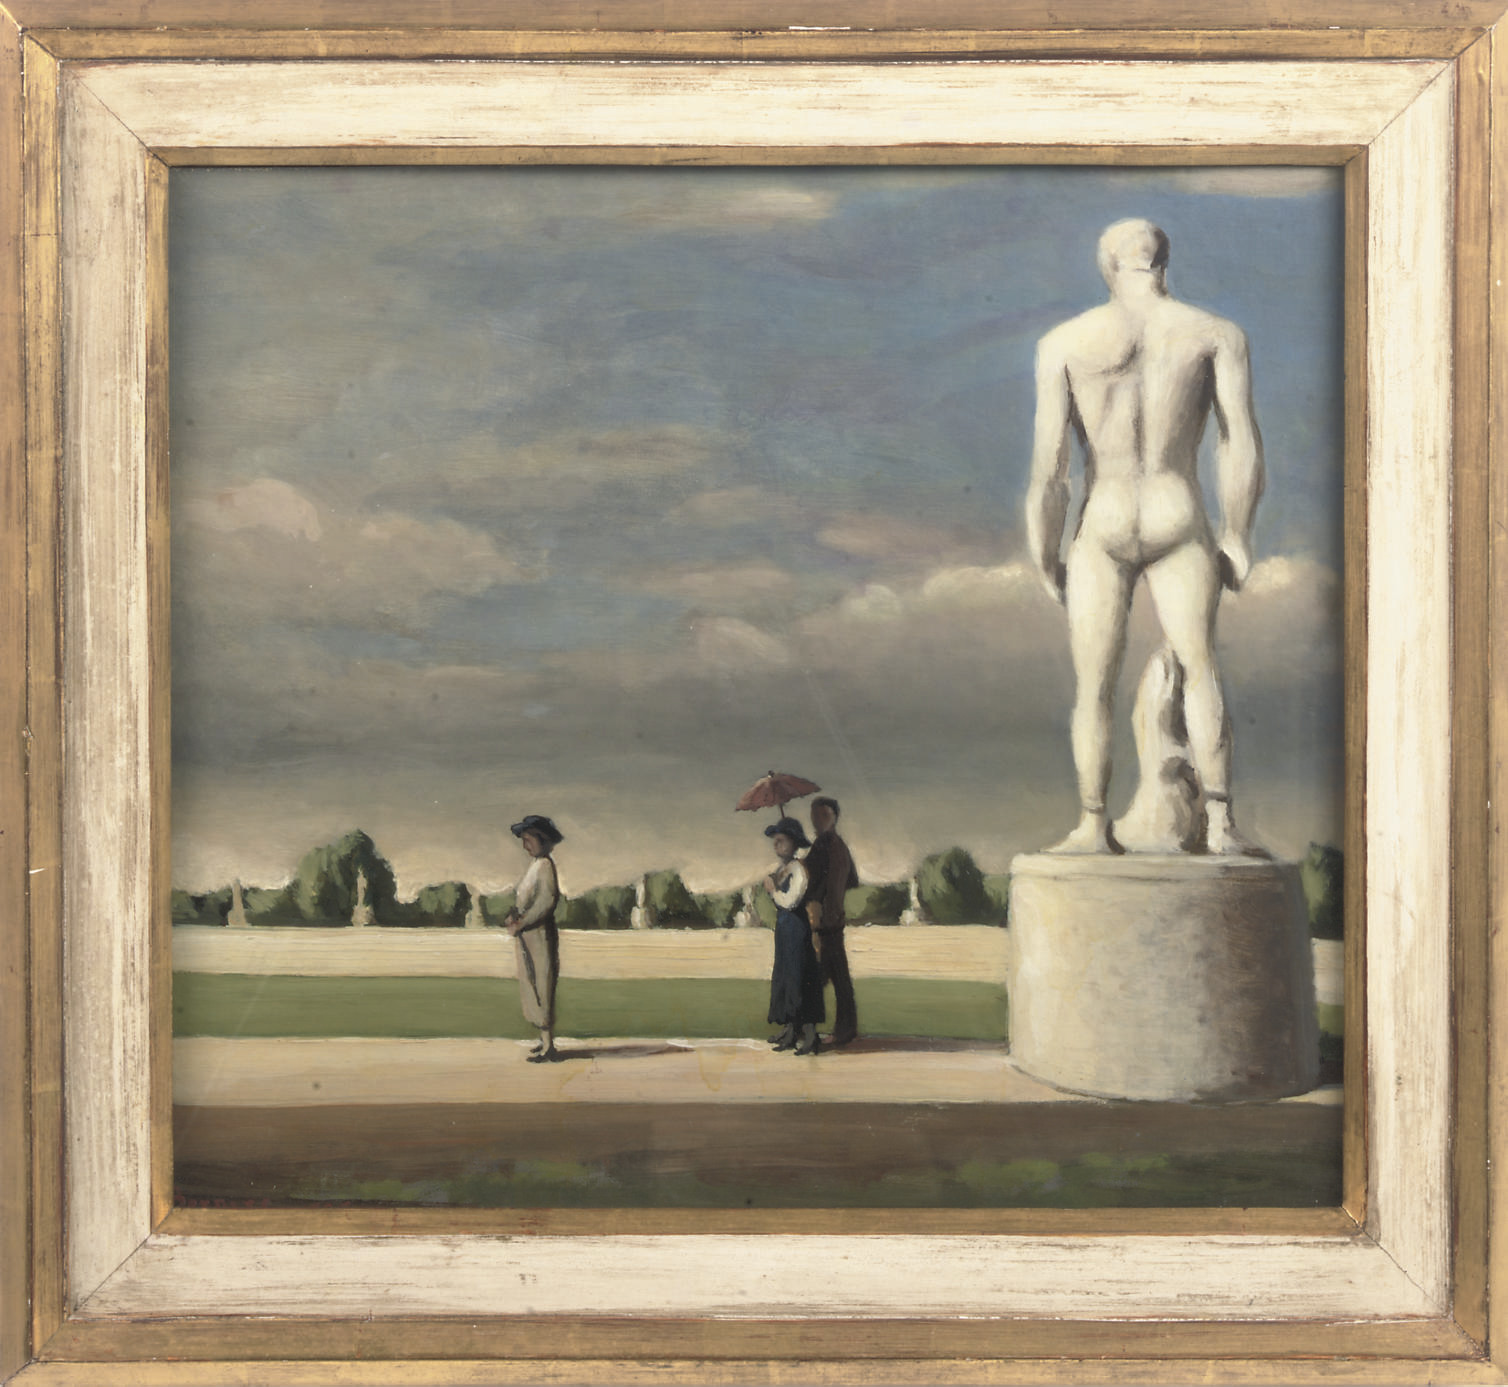 LORD BERNERS (BRITISH, 1883-1950)